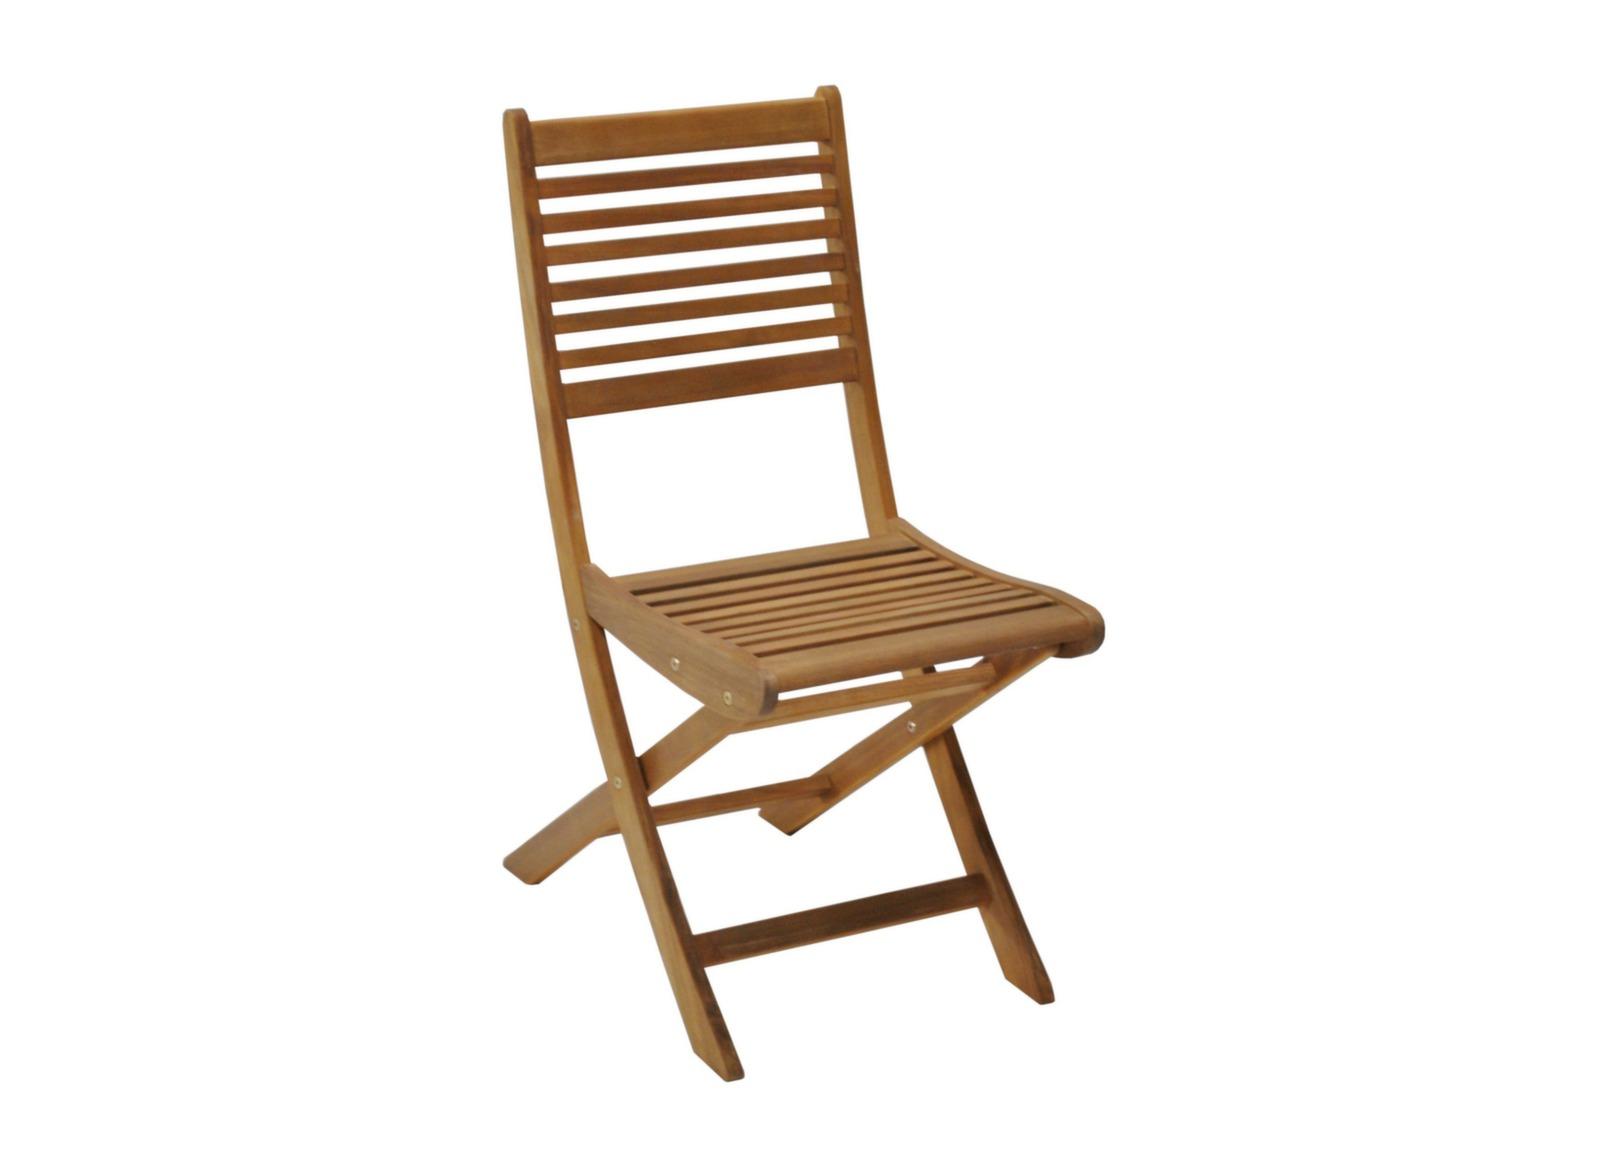 Chaise de jardin en eucalyptus Saturne – Proloisirs